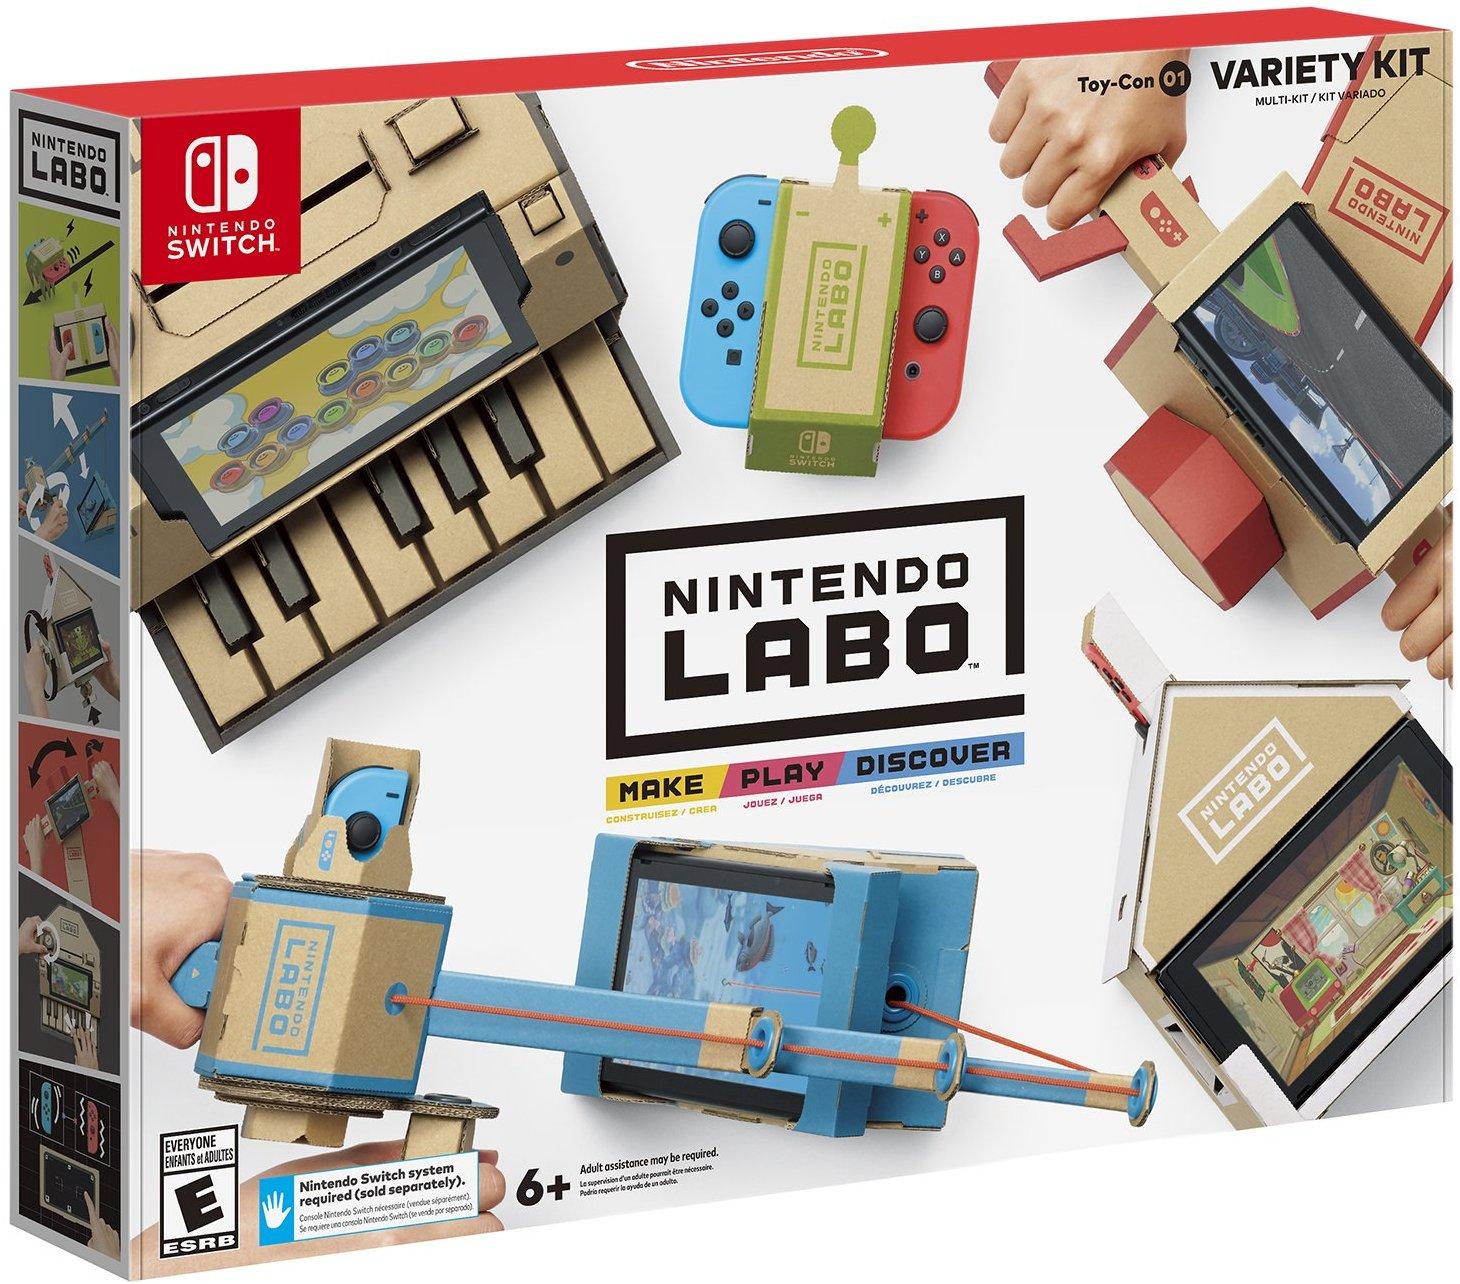 Introducing Nintendo Labo